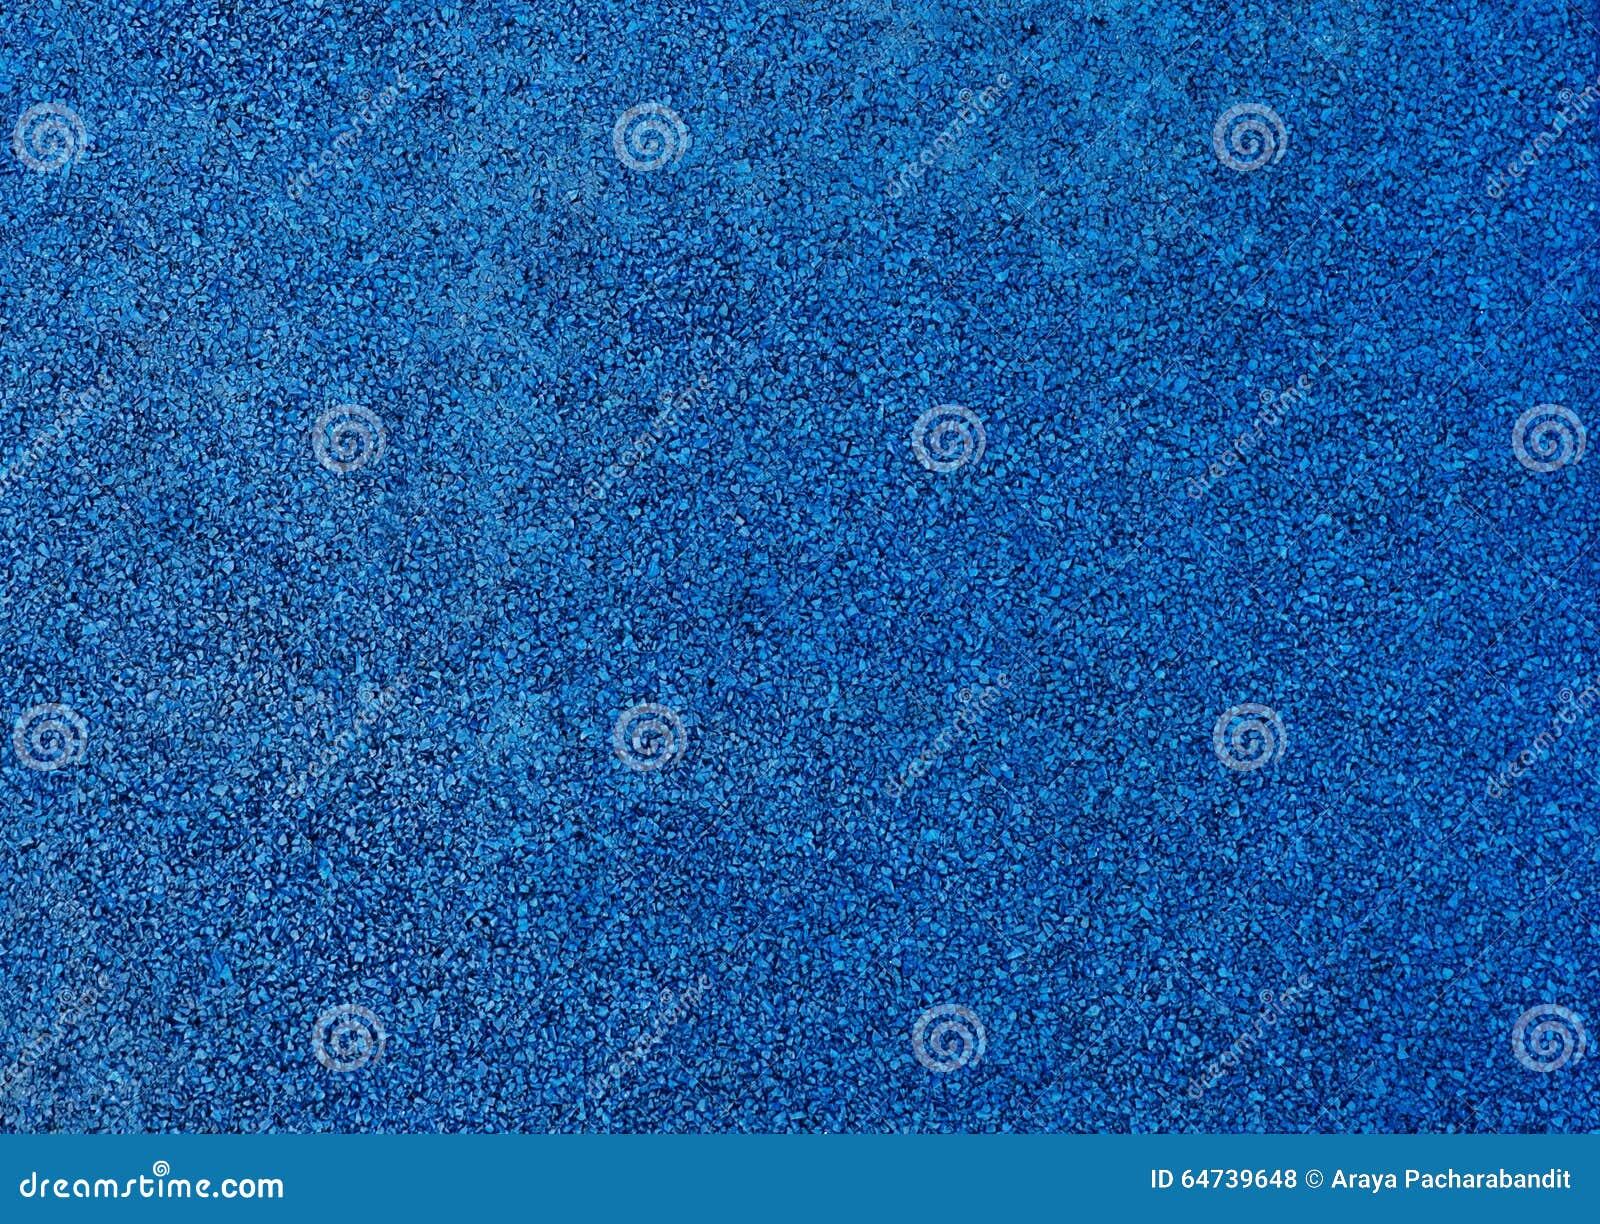 Horizontal Texture Of Blue Tarmac Floor Texture Background ...